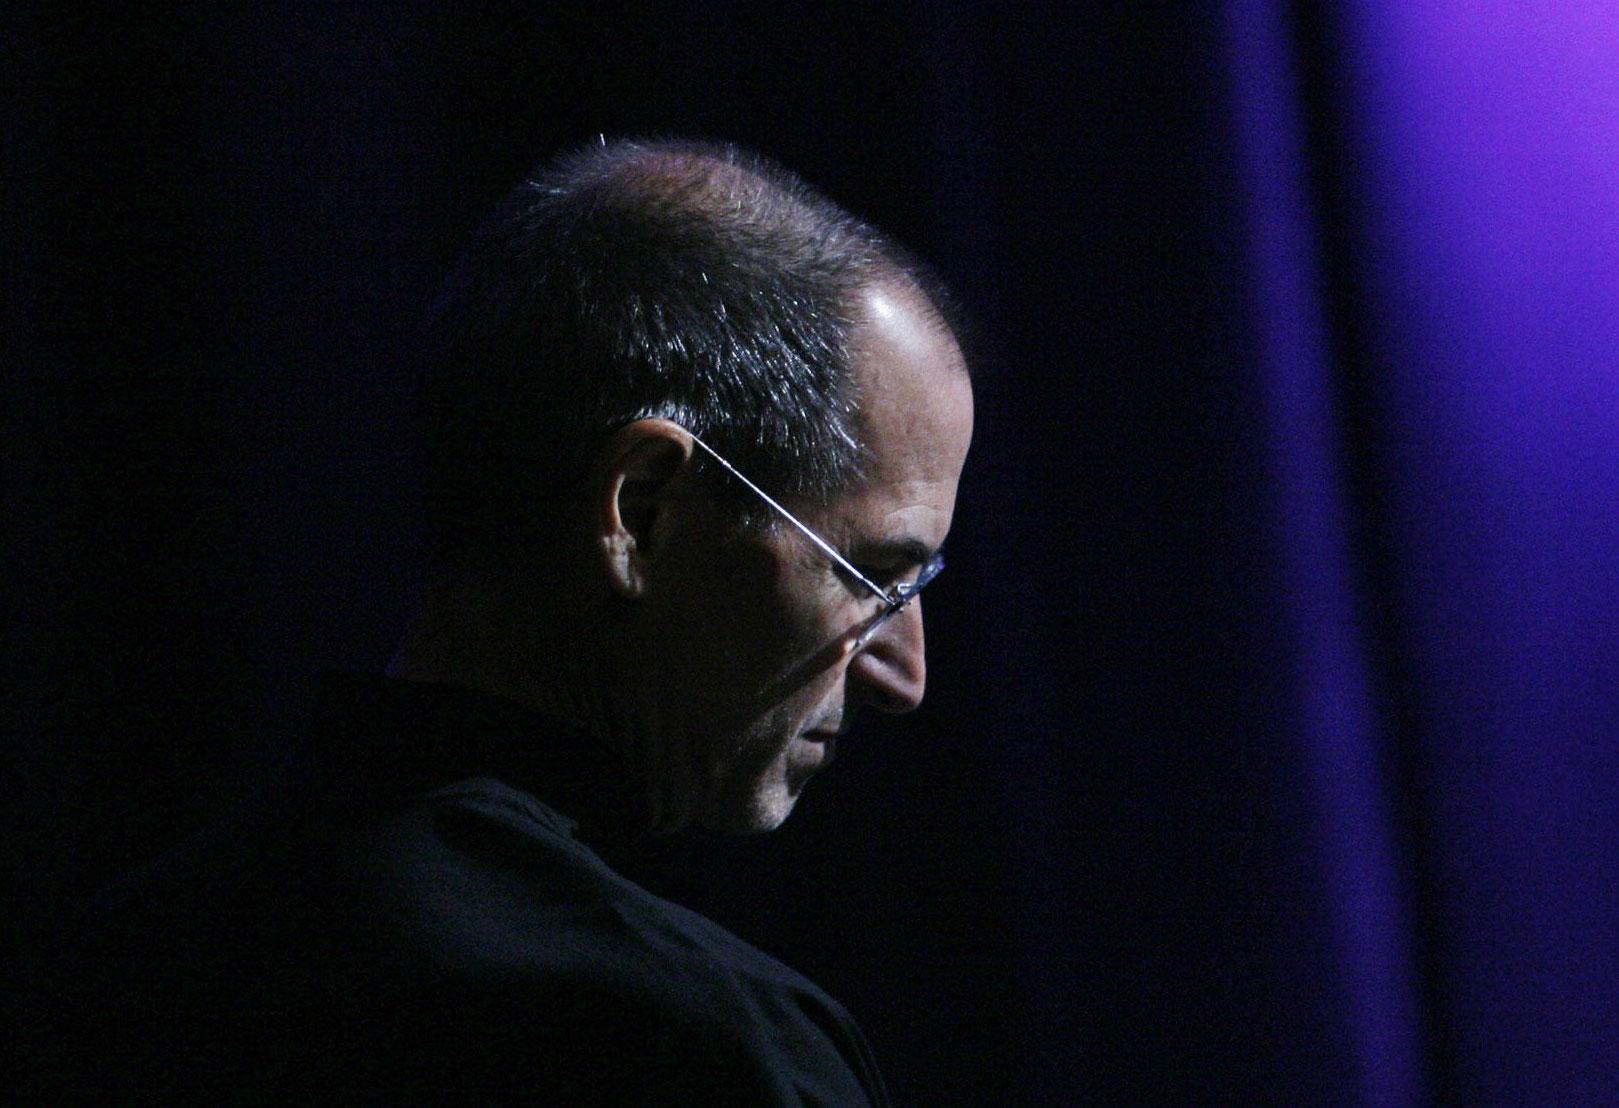 The Steve Jobs ripple effect